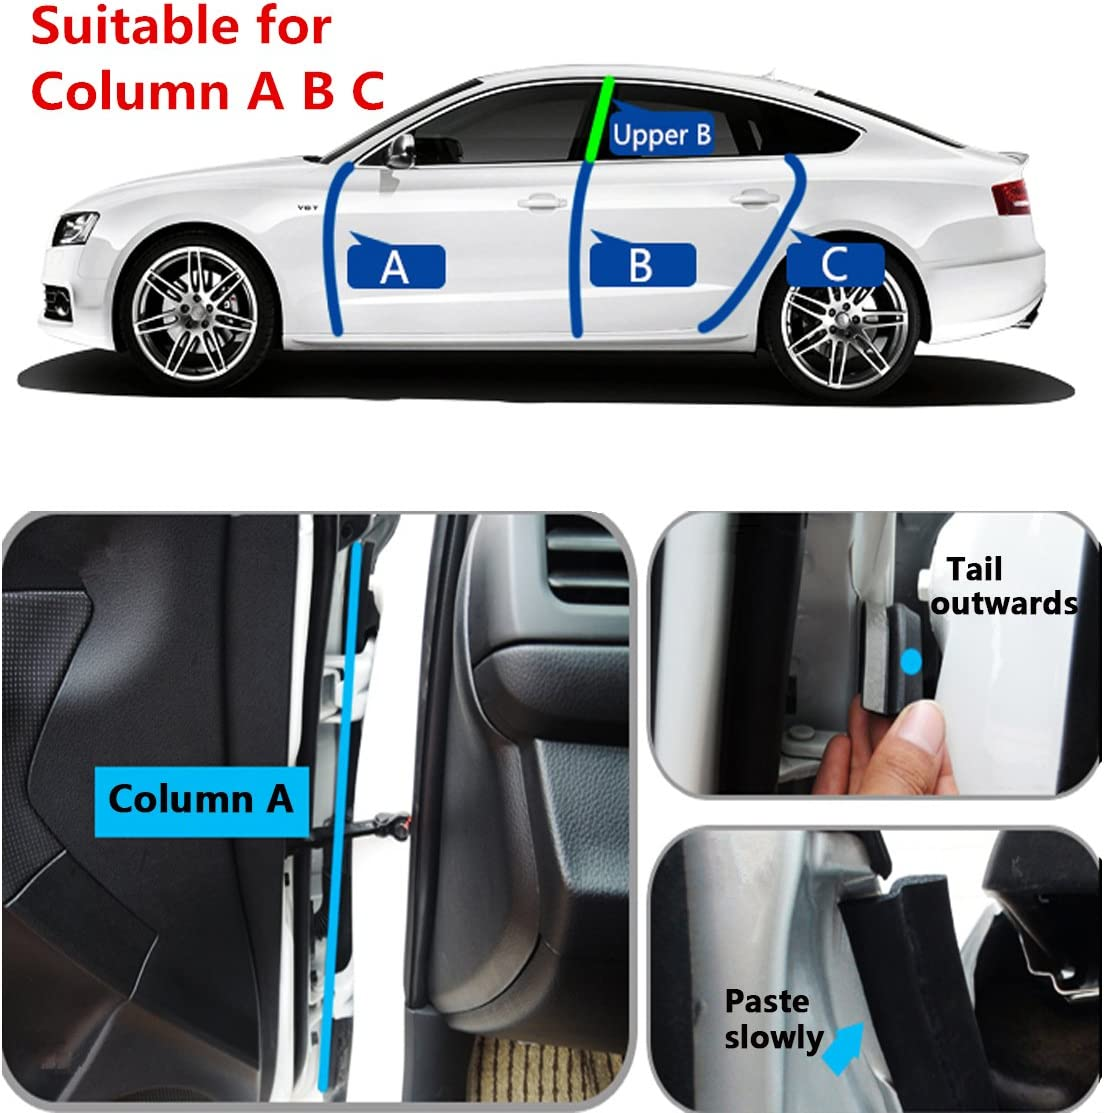 4M Car Door Rubber Seal Z Shape Trim Seal Door Edge Guards Weatherstrip Hollow for Car Truck Motor Protector MATCC 13Ft